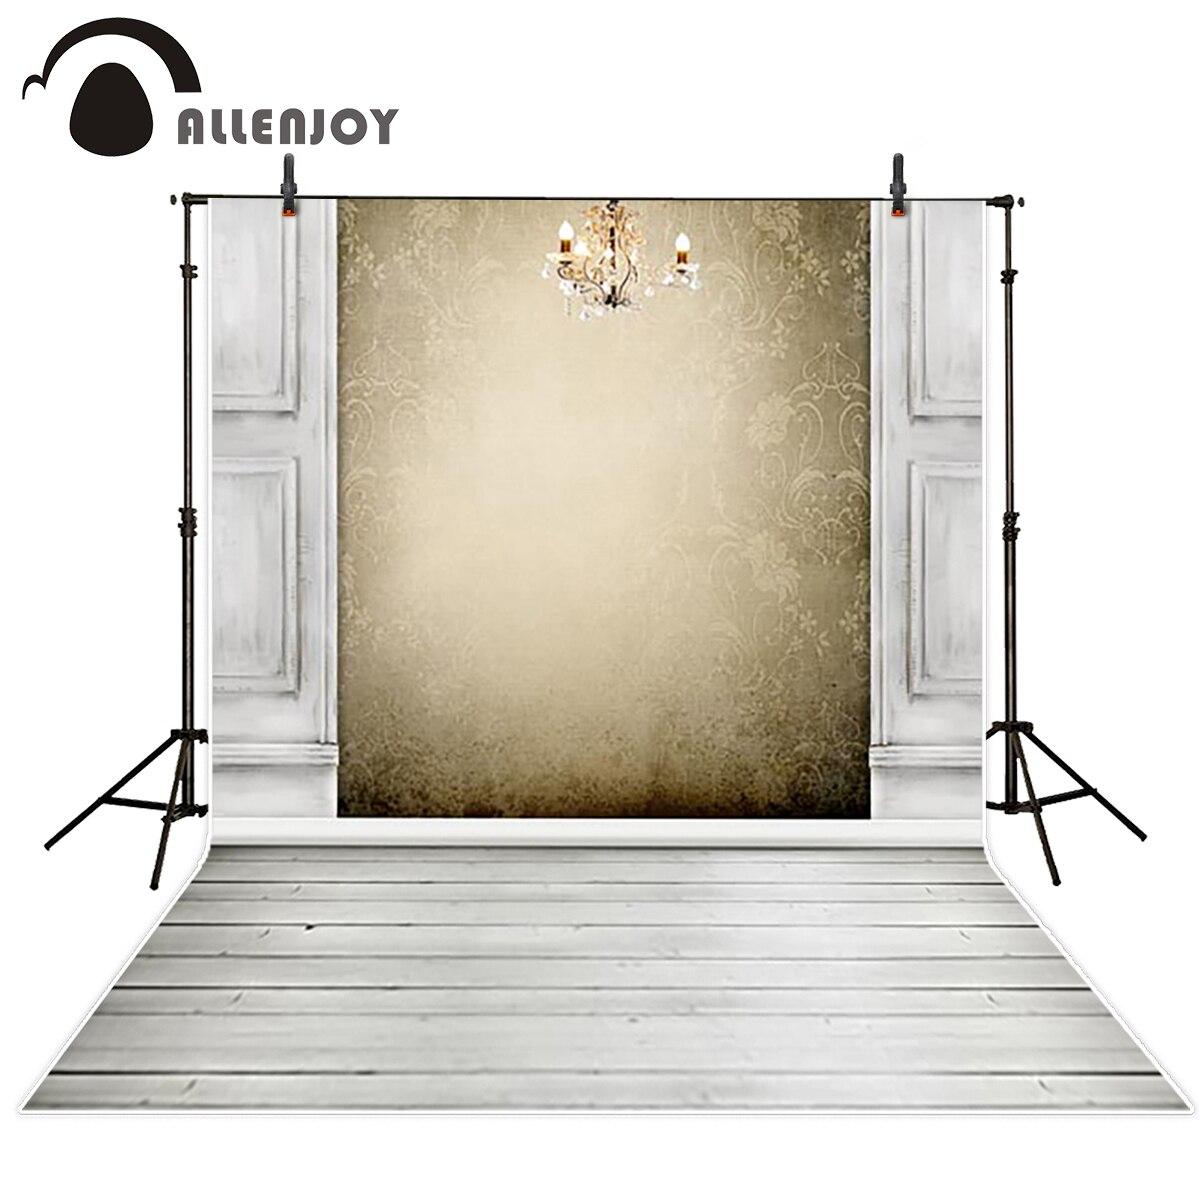 Allenjoy brown damask wall wood floor photography backgrounds vintage custom portrait backdrop photo studio photoshoot booth